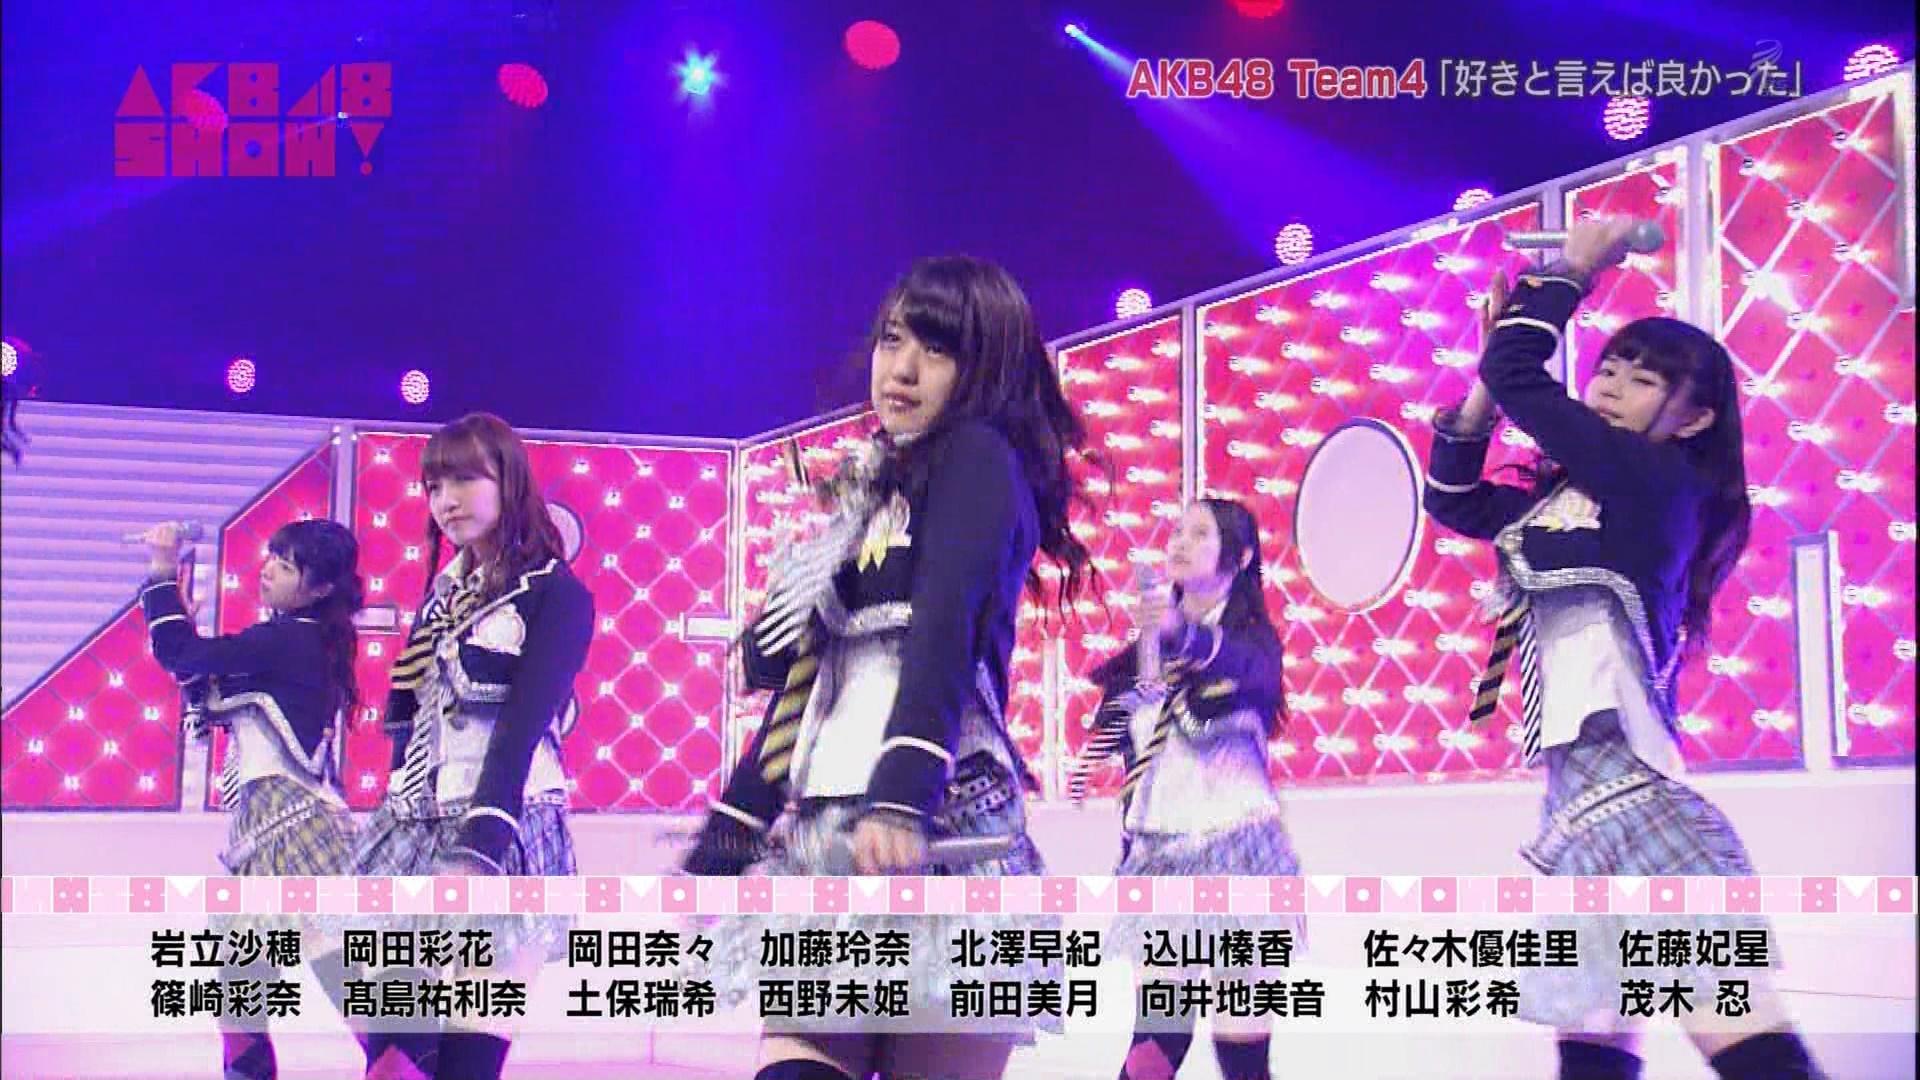 AKB48SHOW チーム4好きといえば良かった 加藤玲奈 20140830 (1)